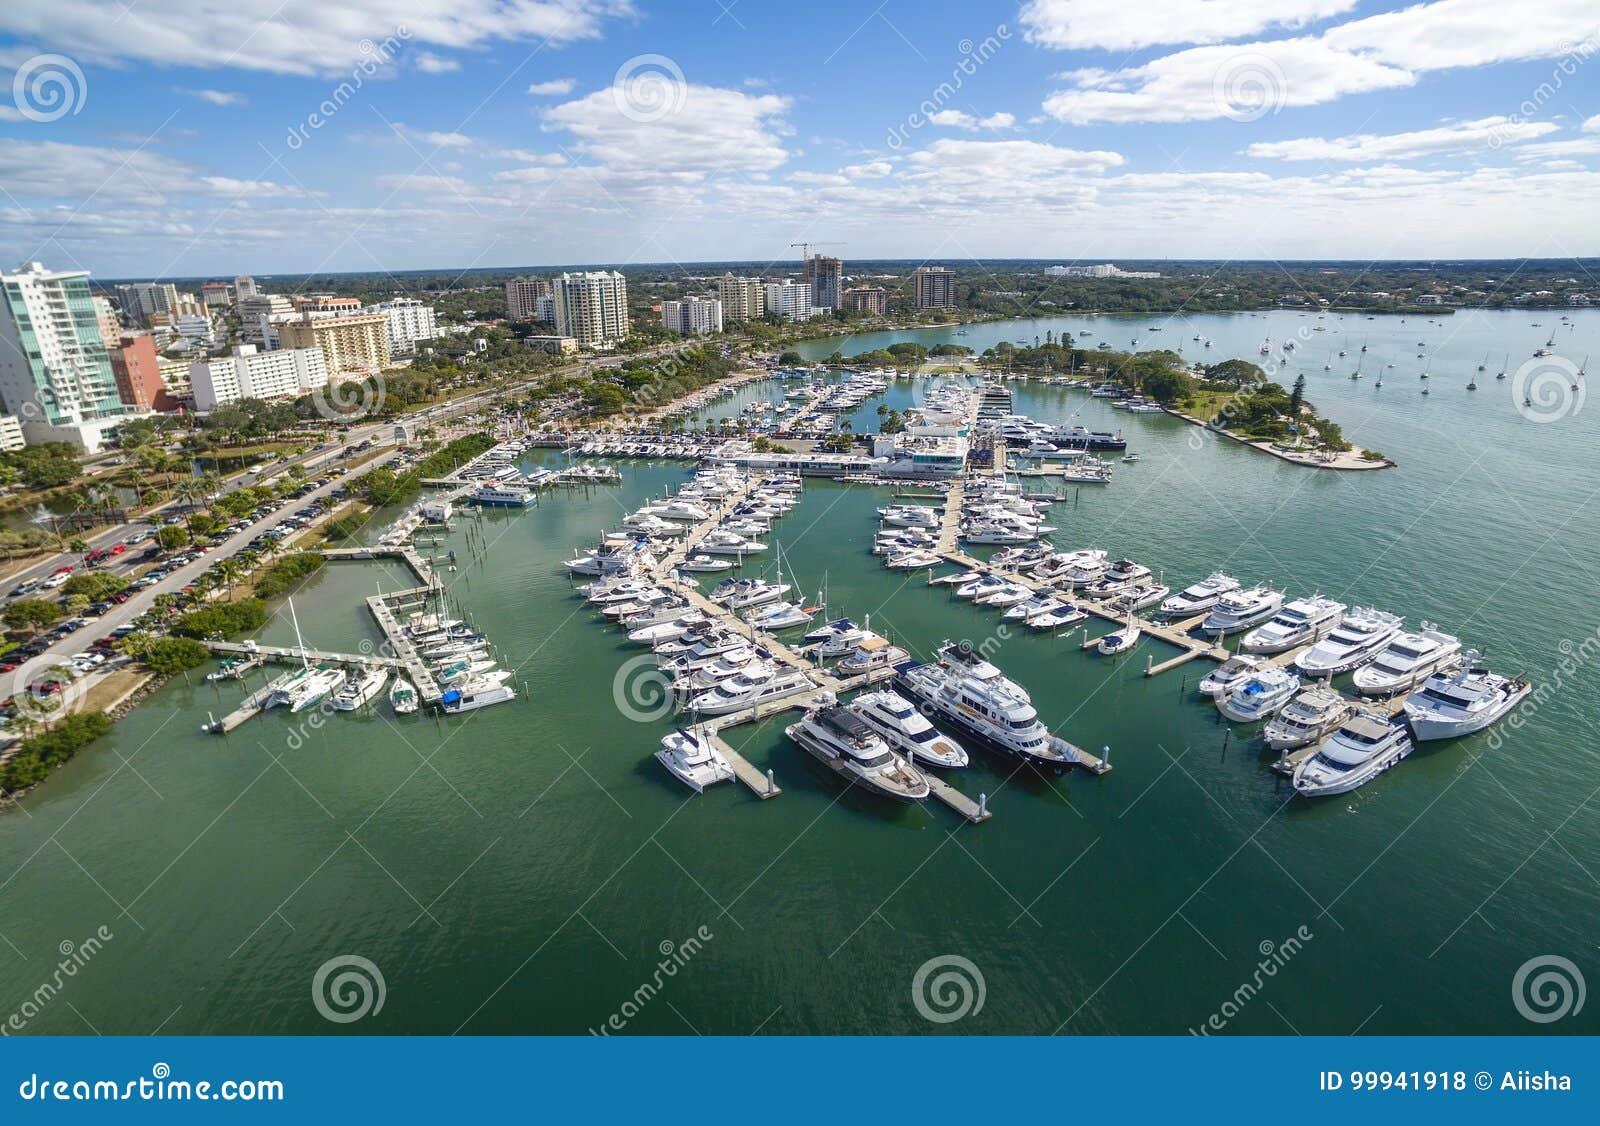 Aerial view of the Sarasota downtown, Florida.